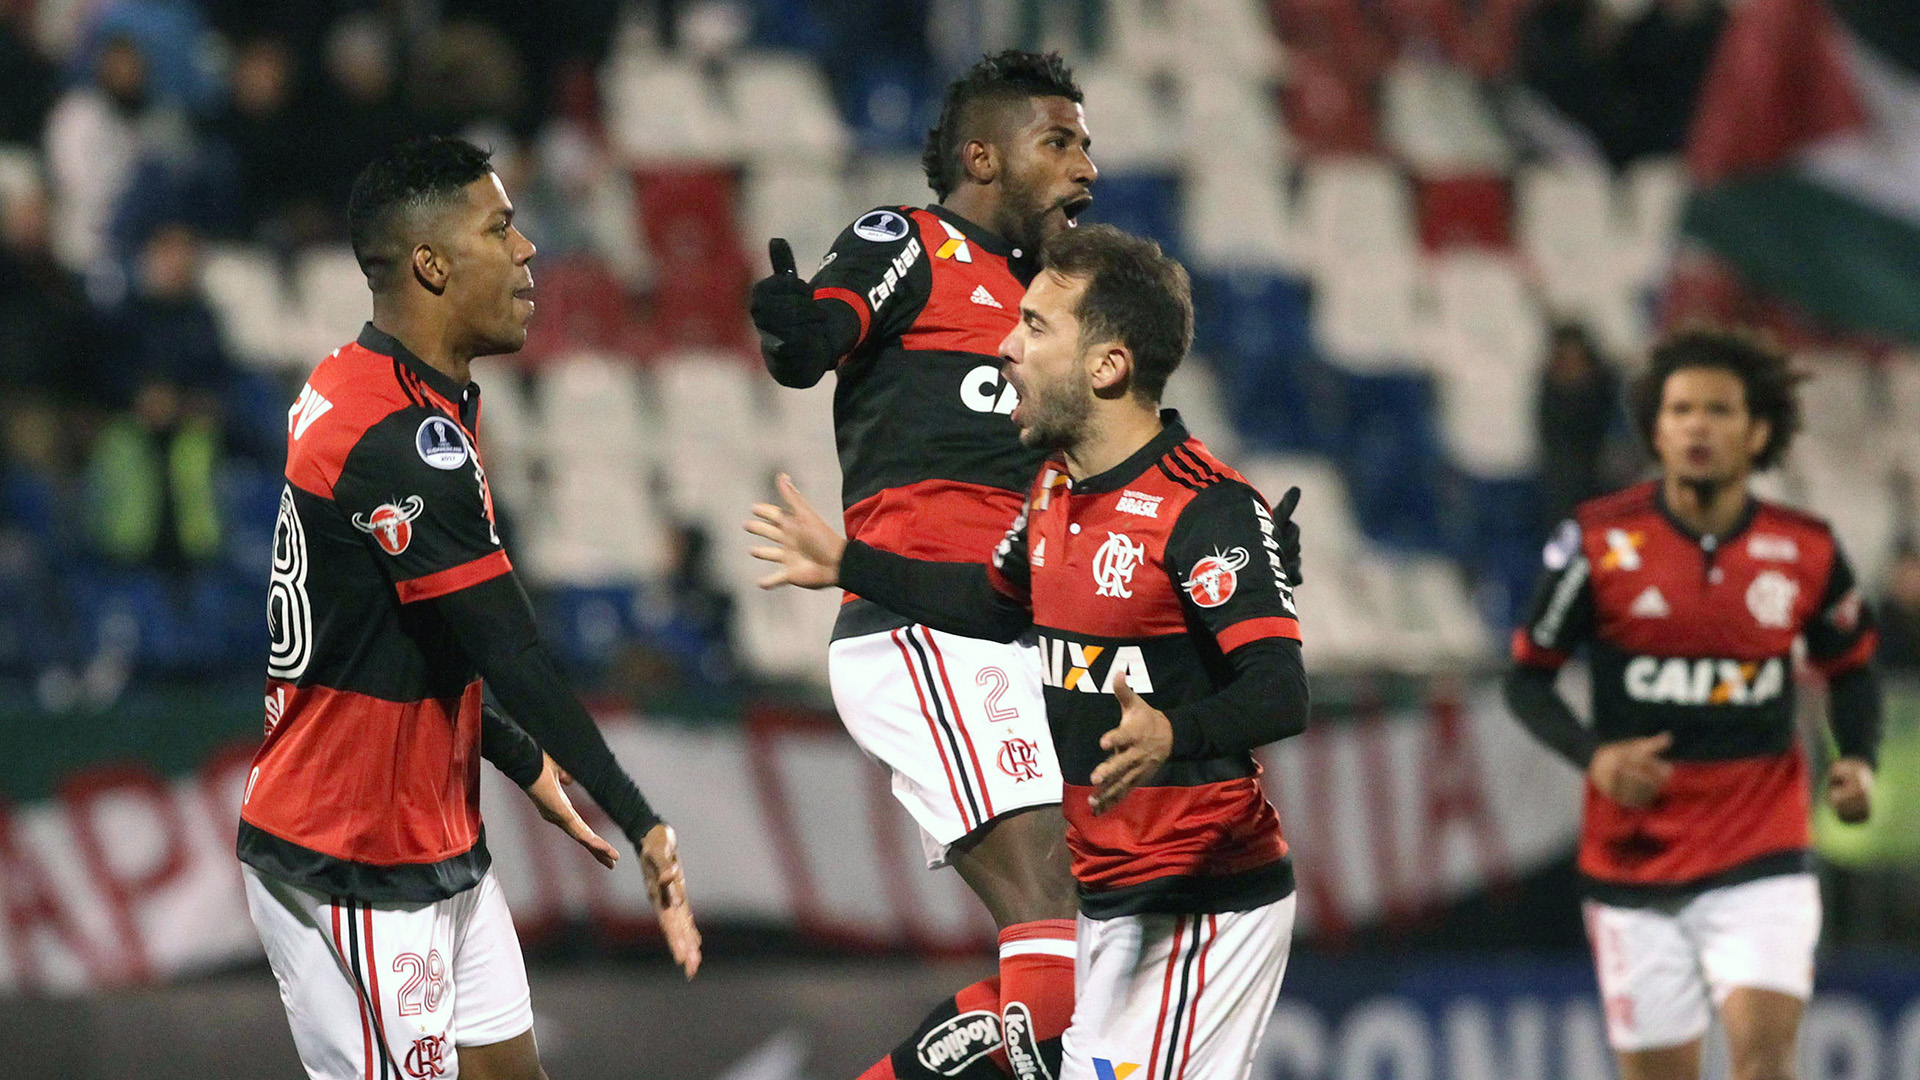 Everton Ribeiro Orlando Berrio Rodinei Palestino Flamengo Copa Sudamericana